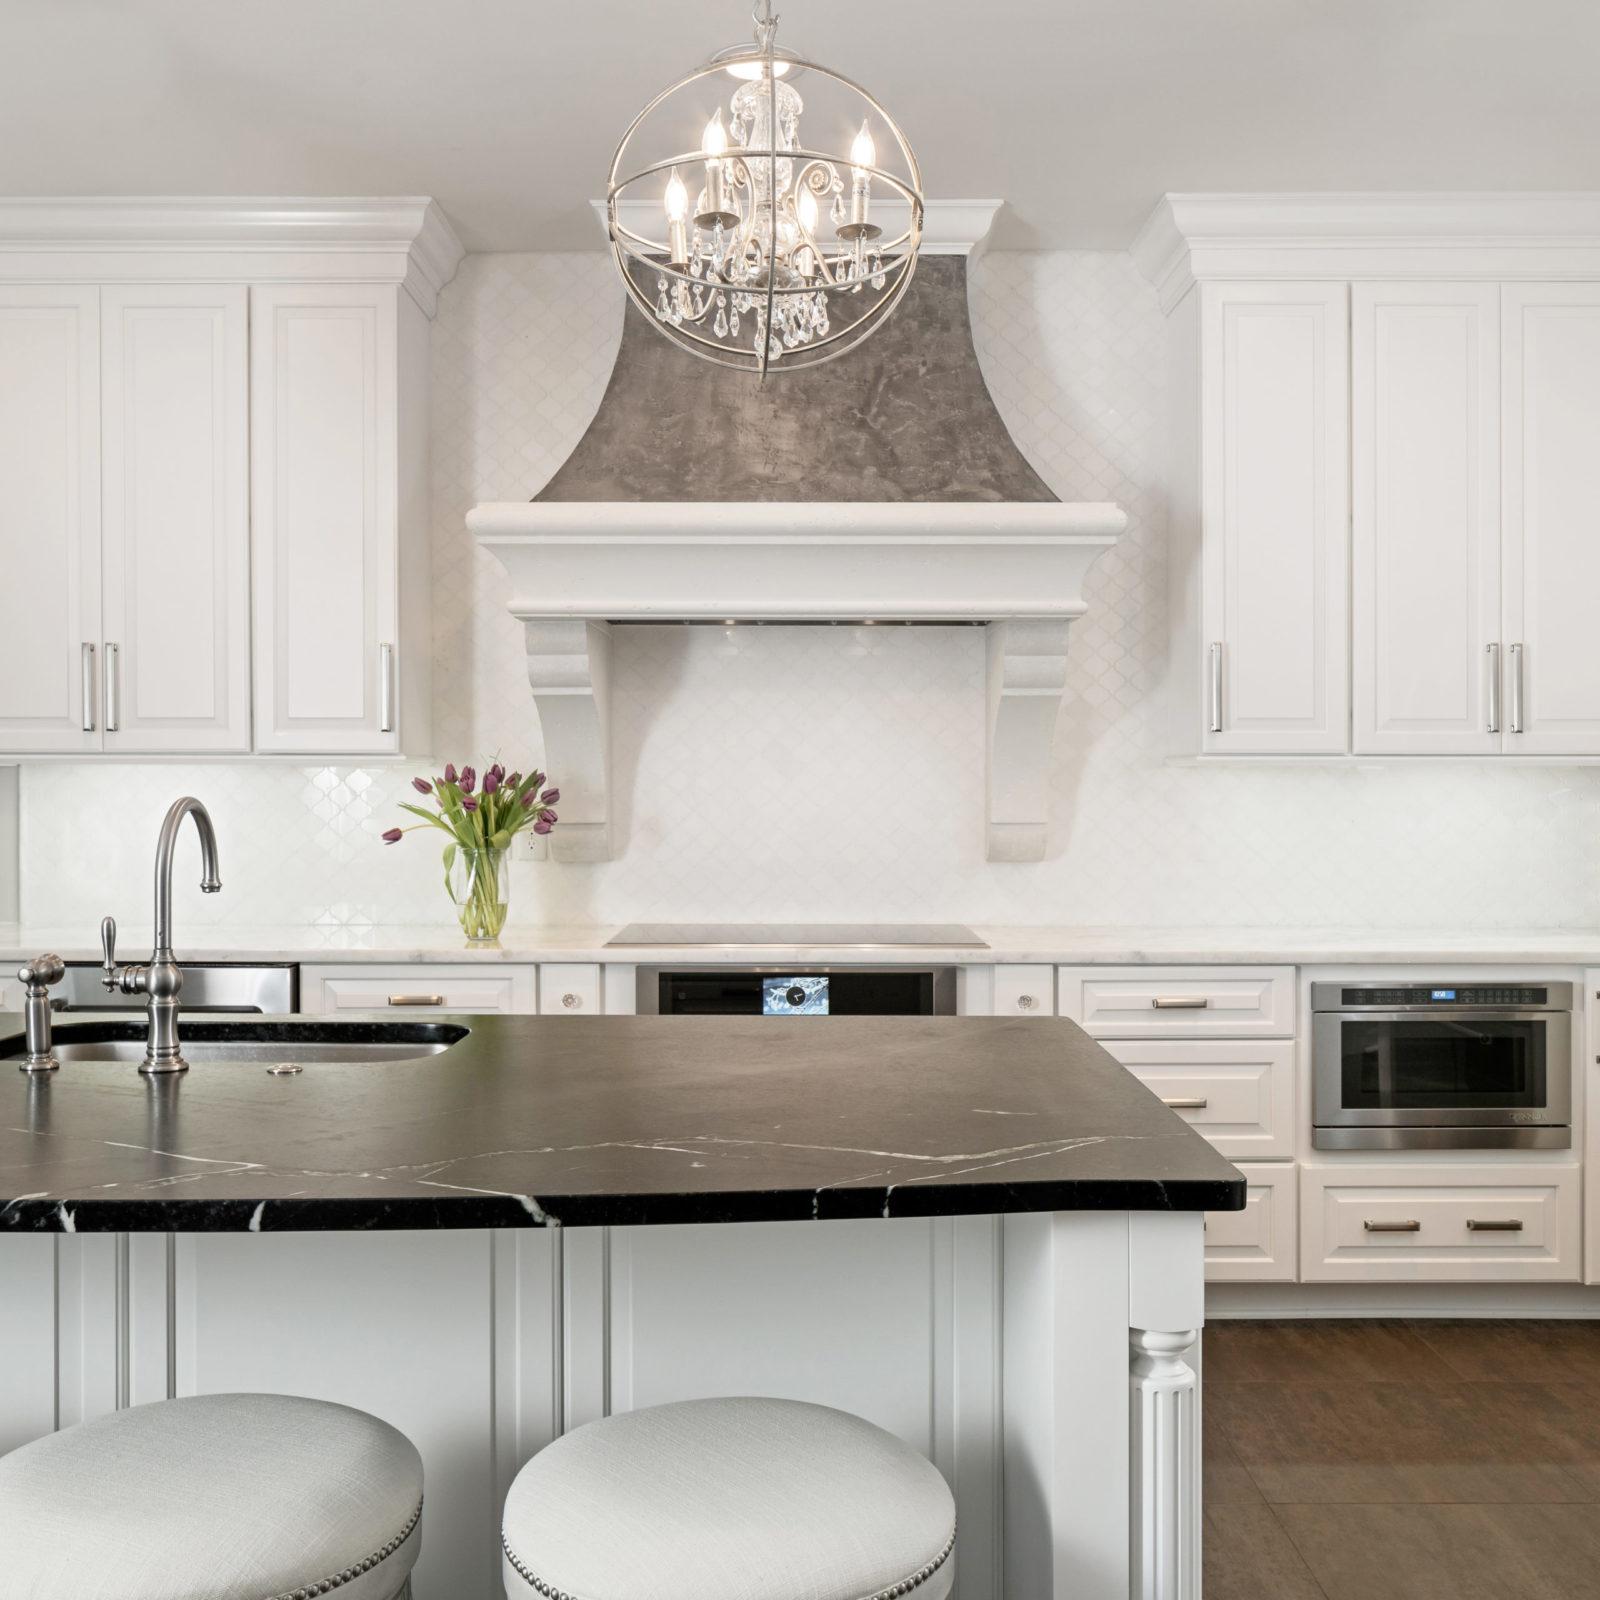 kitchen-remodel-black-and-white-design